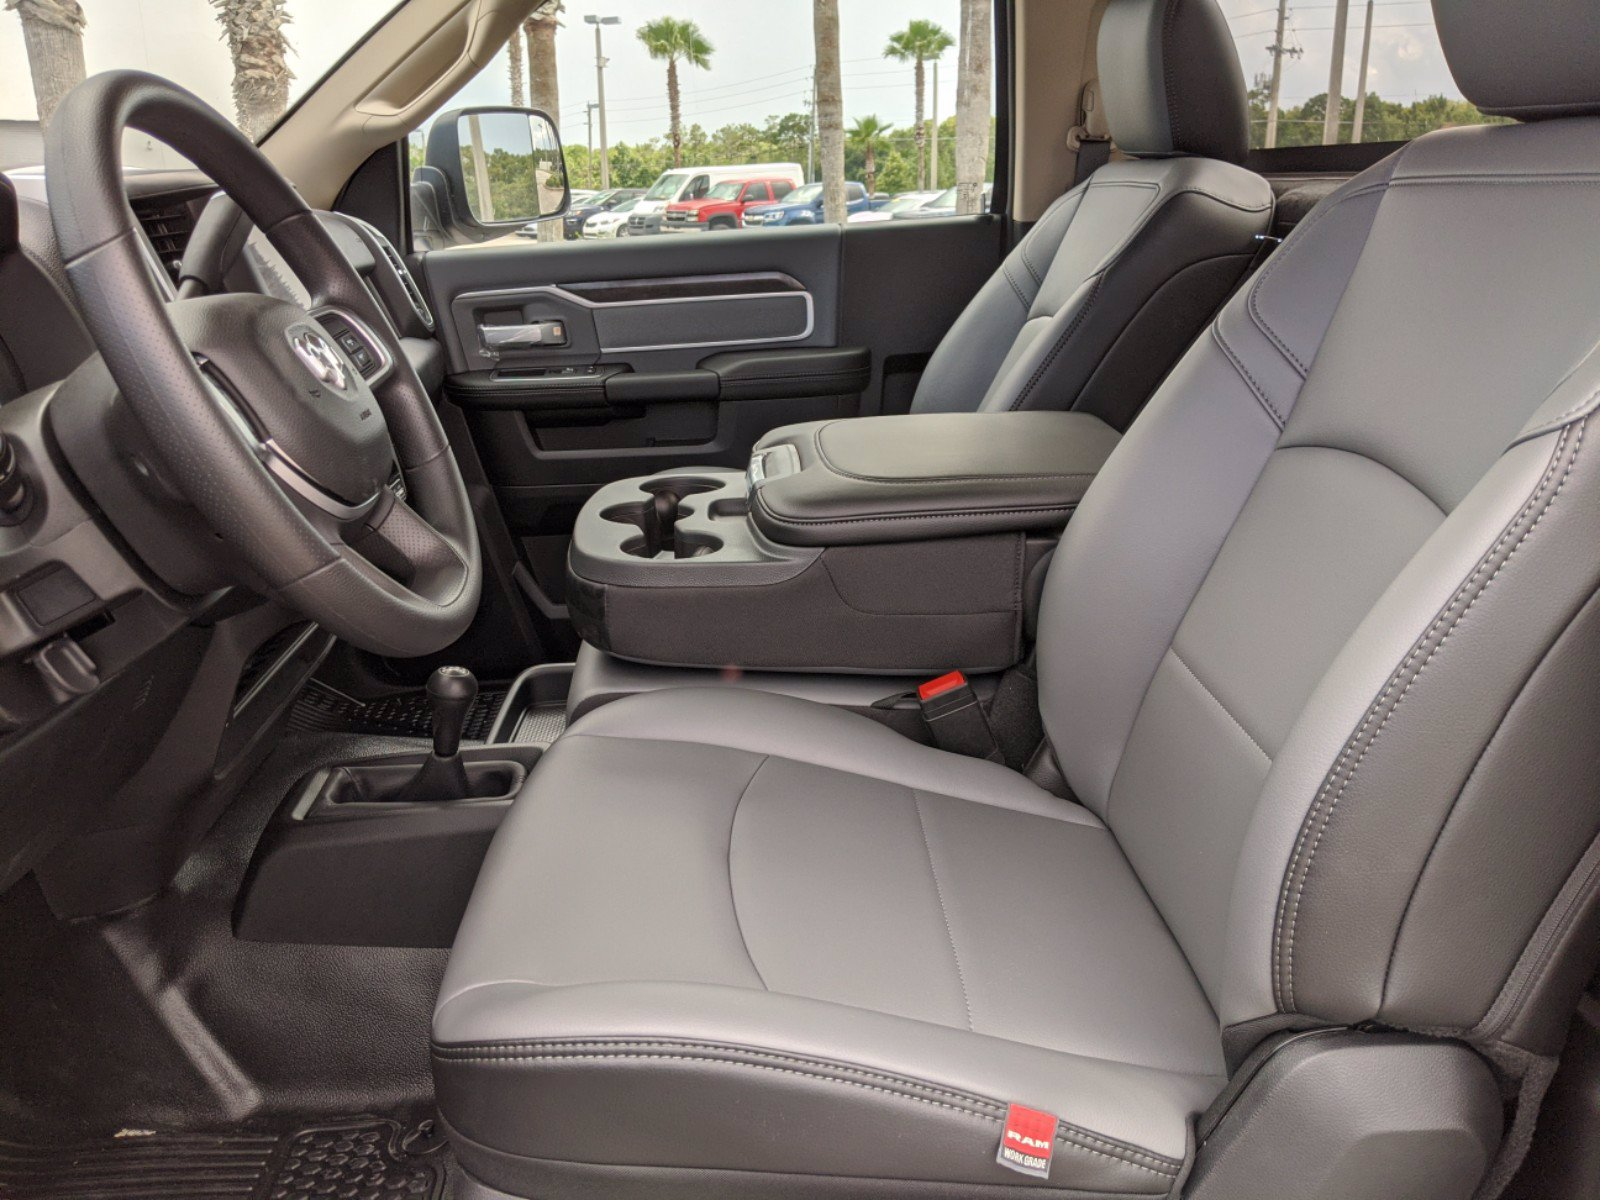 2020 Ram 4500 Regular Cab DRW 4x4, Cab Chassis #R20203 - photo 18